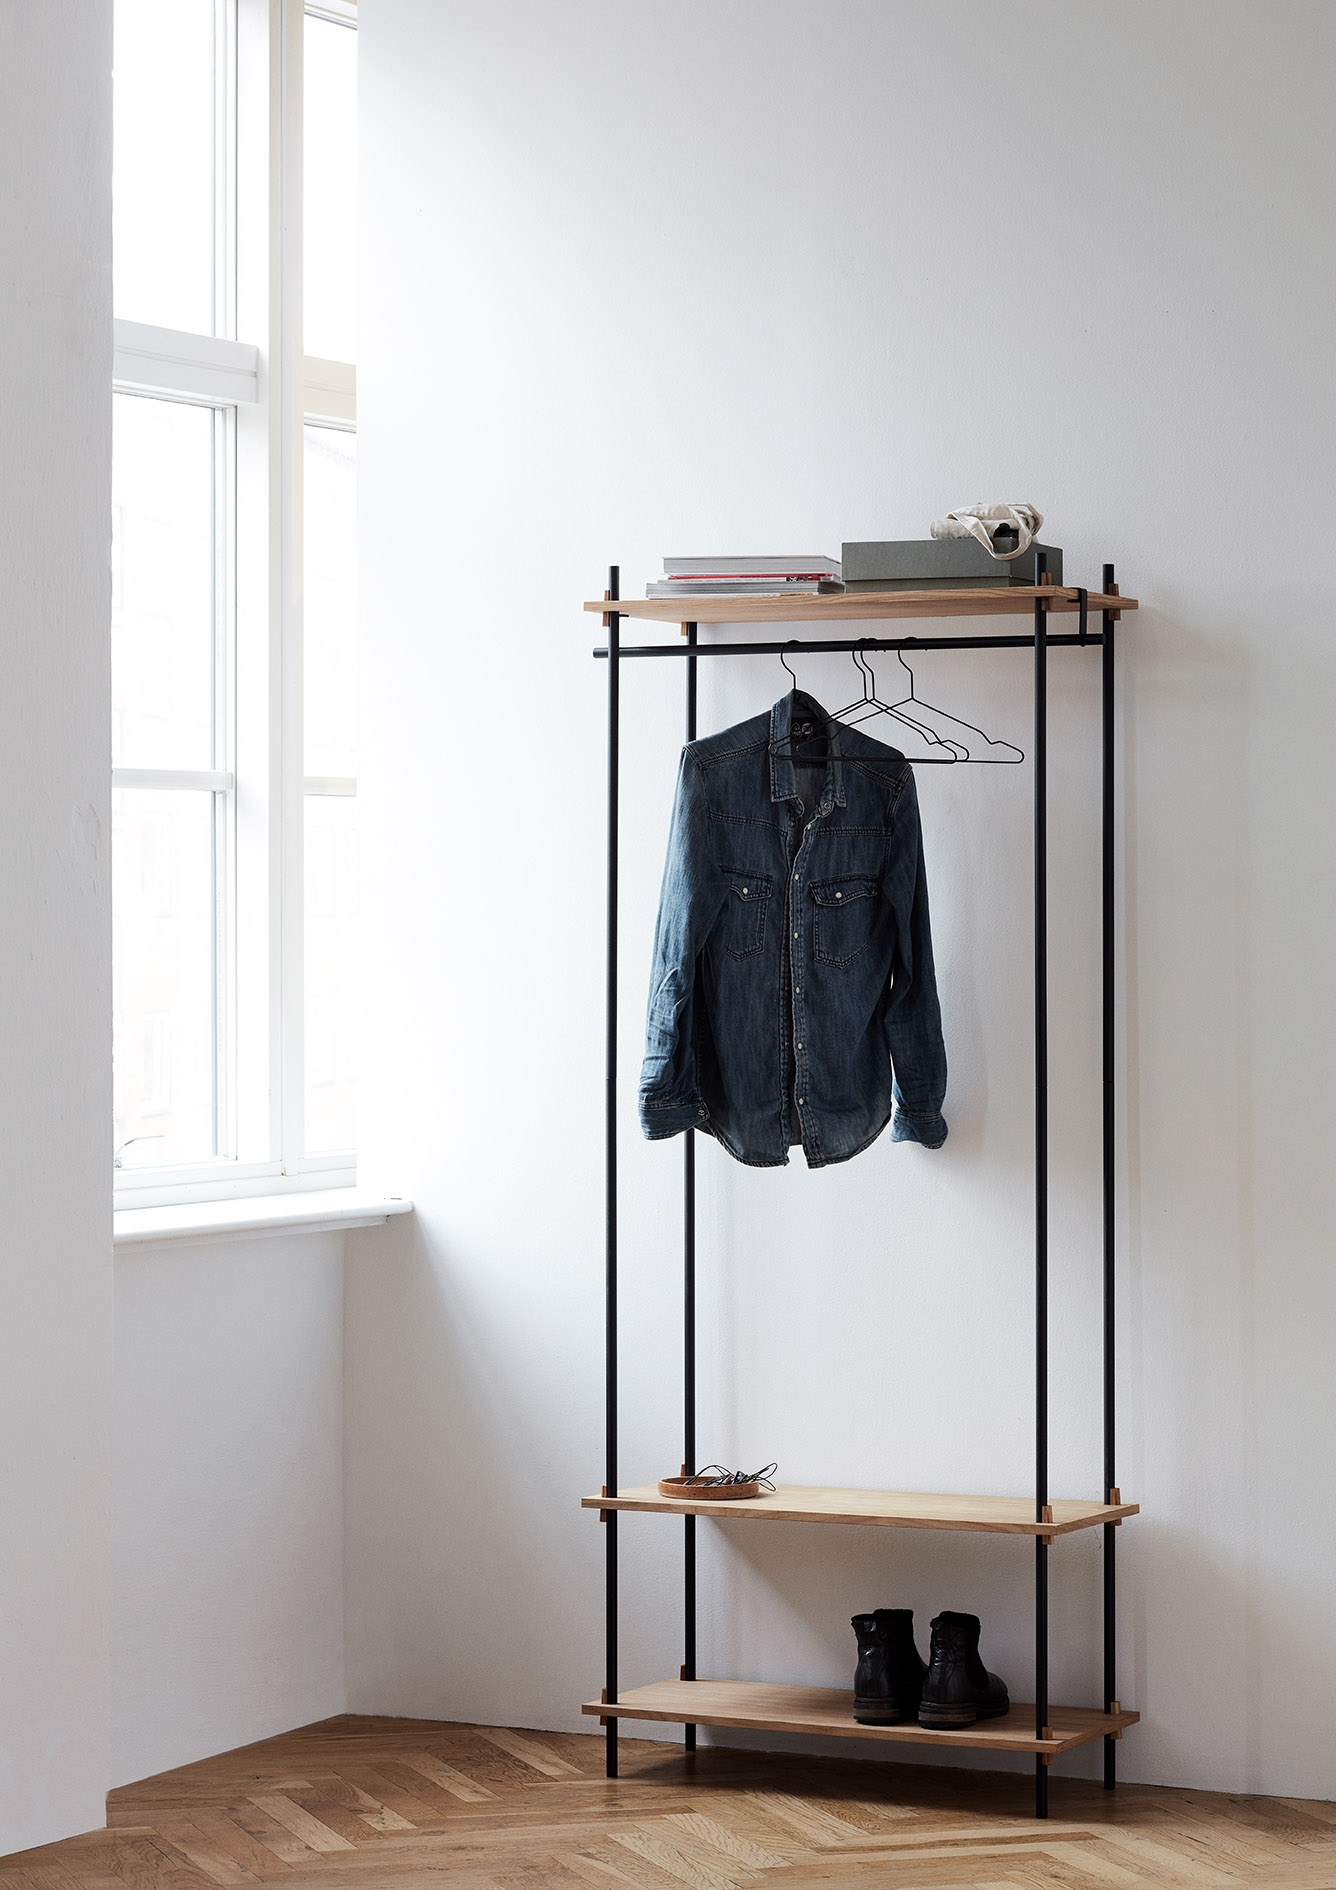 Moebe Shelving System Garderobe